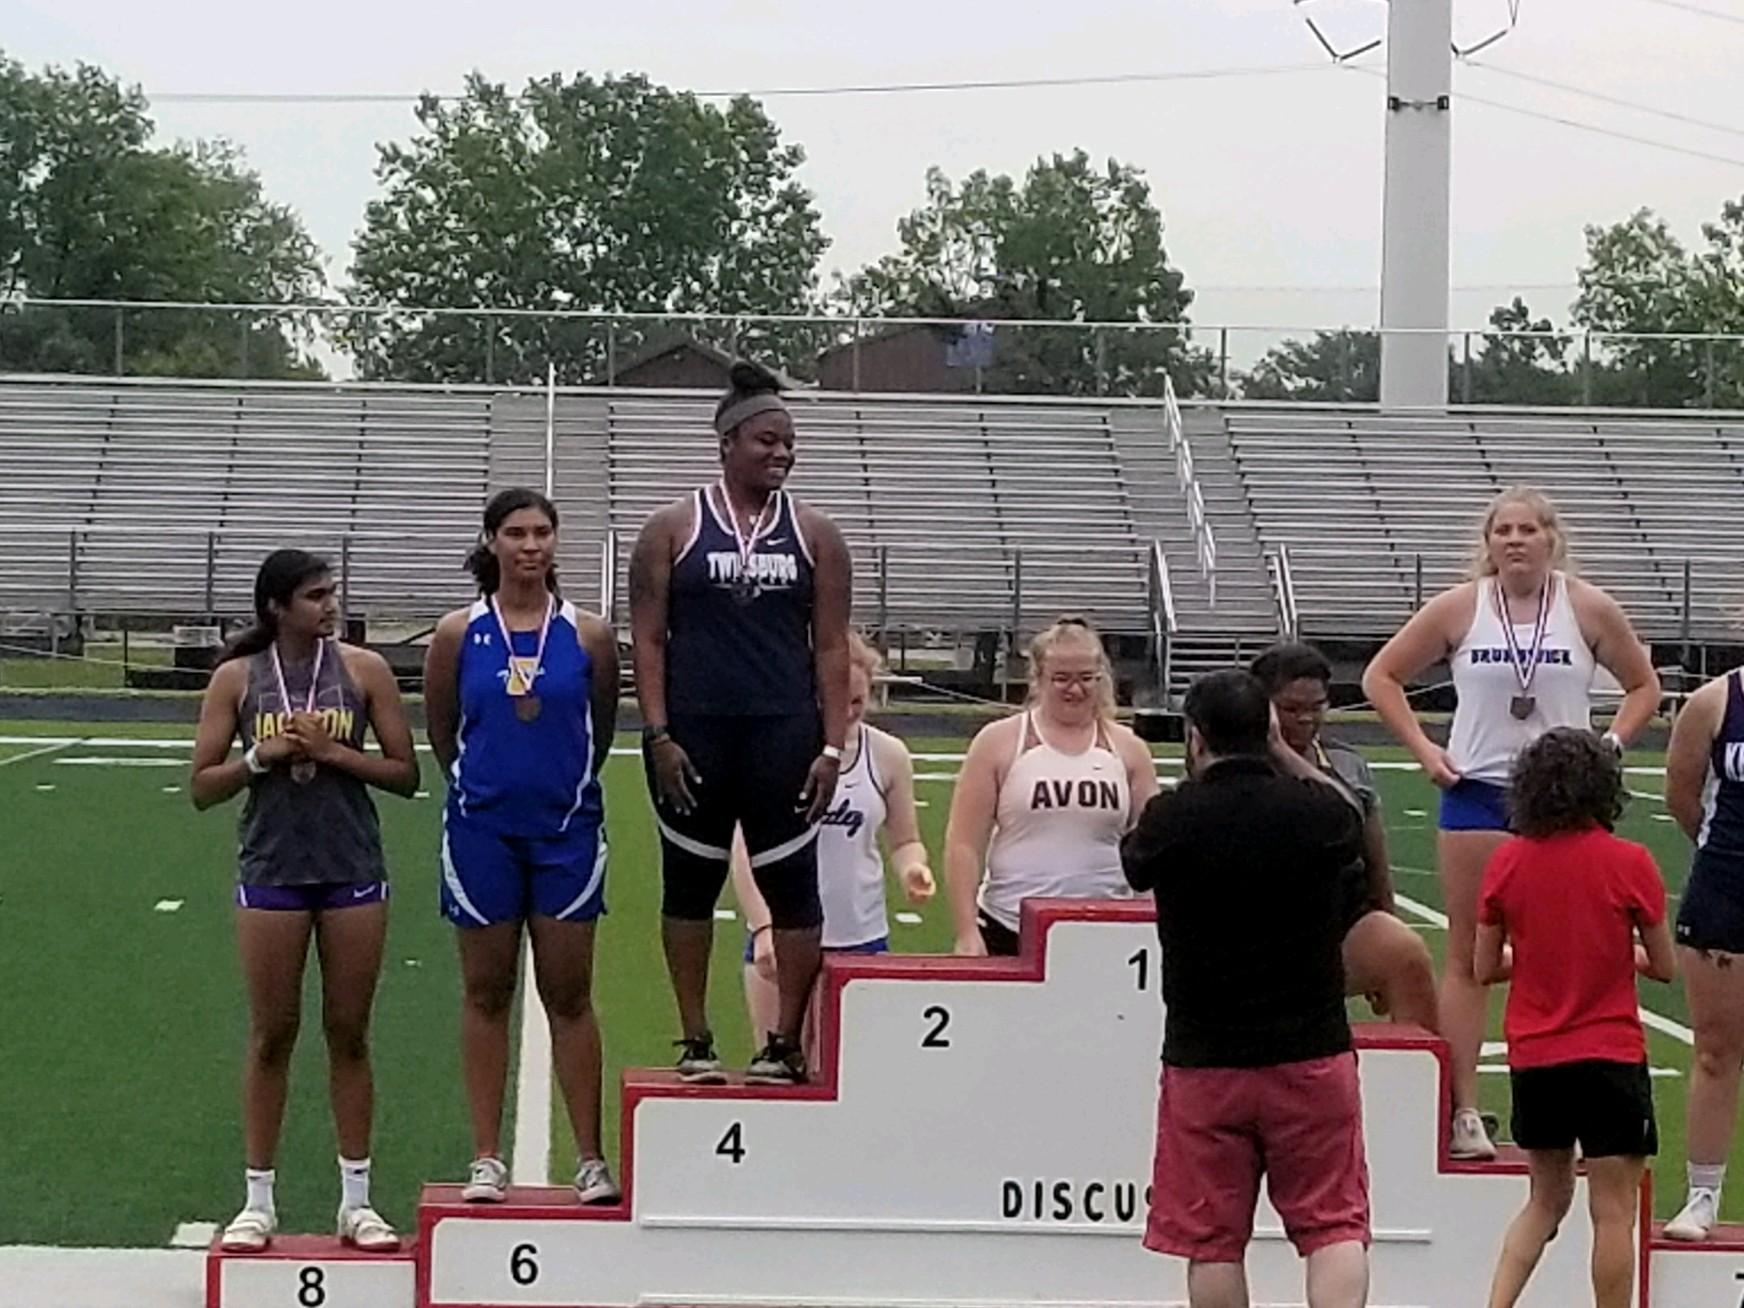 student athletes at podium receiving medals